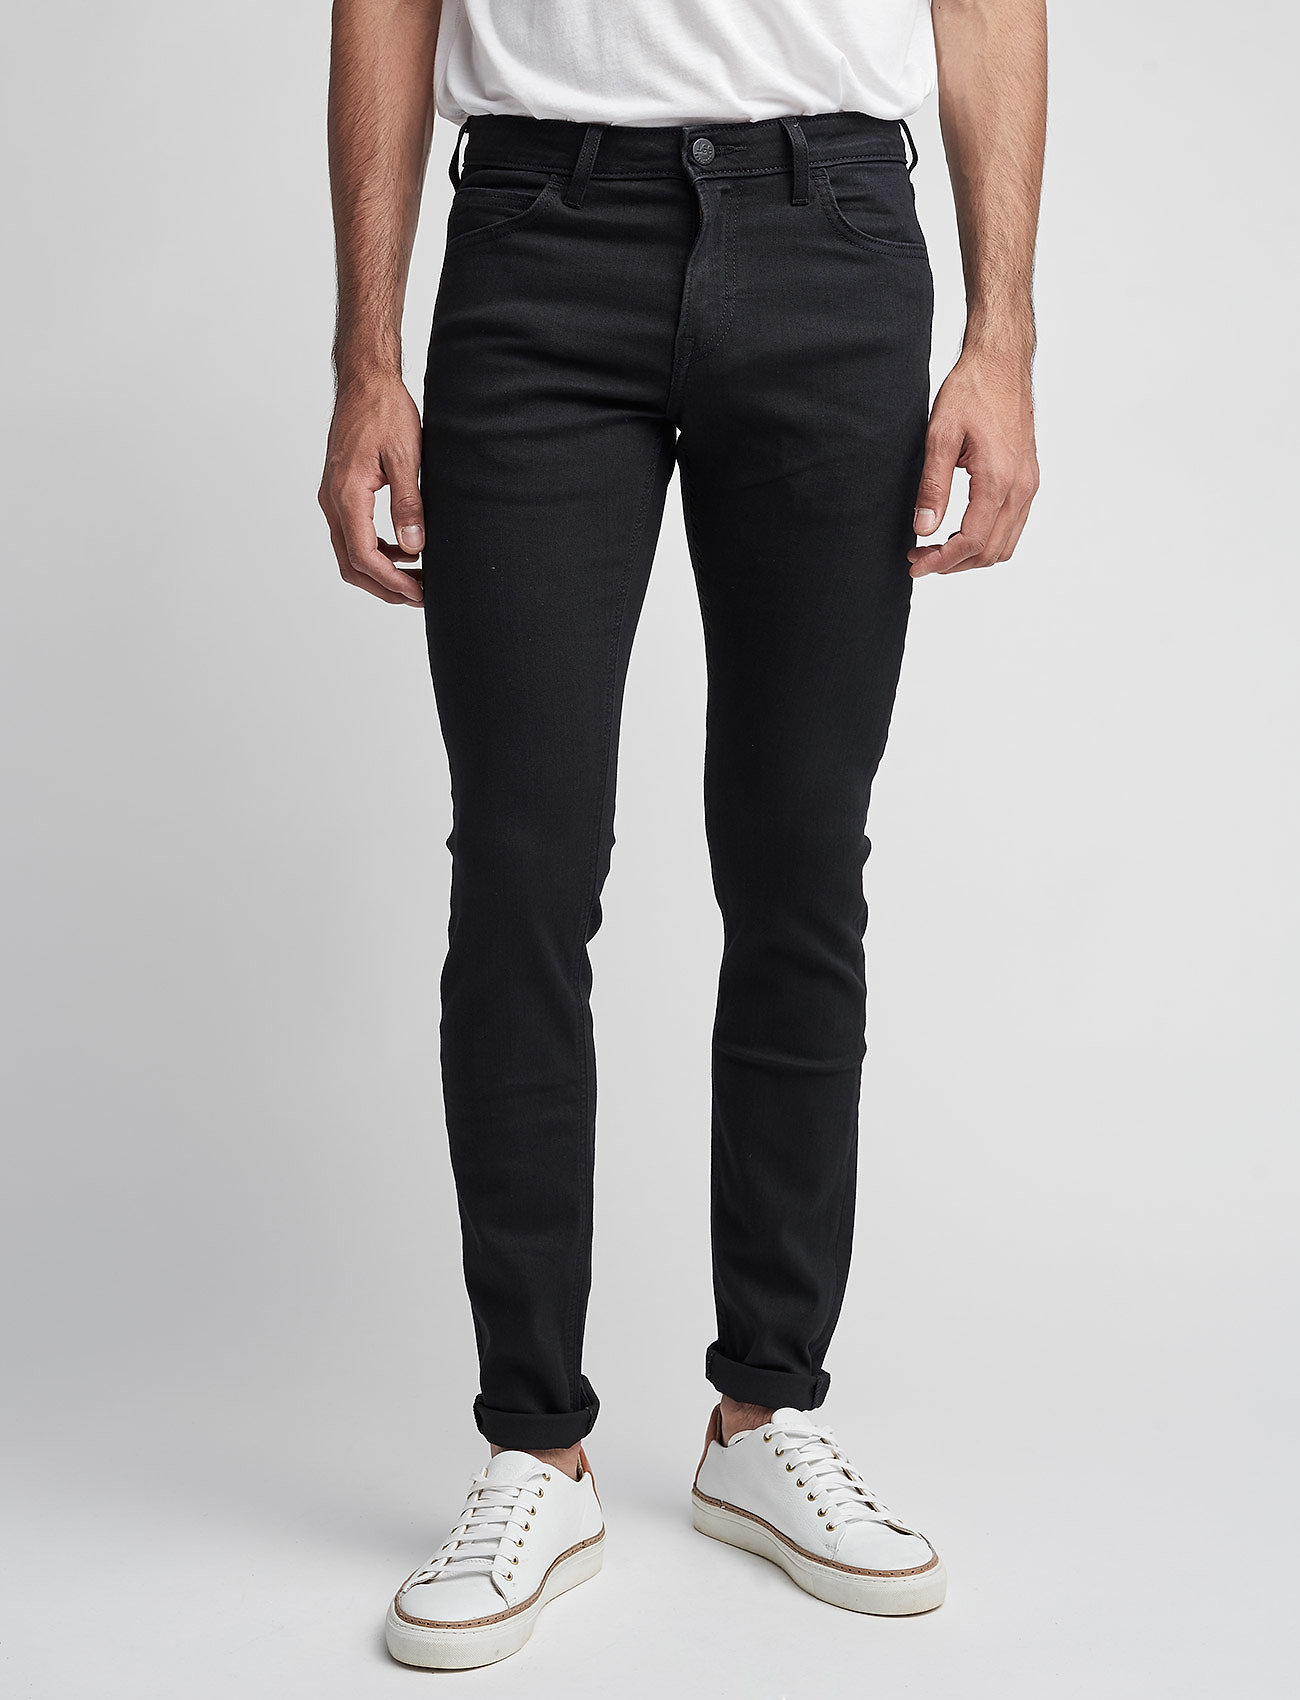 Lee Jeans - MALONE - skinny jeans - black rinse - 0